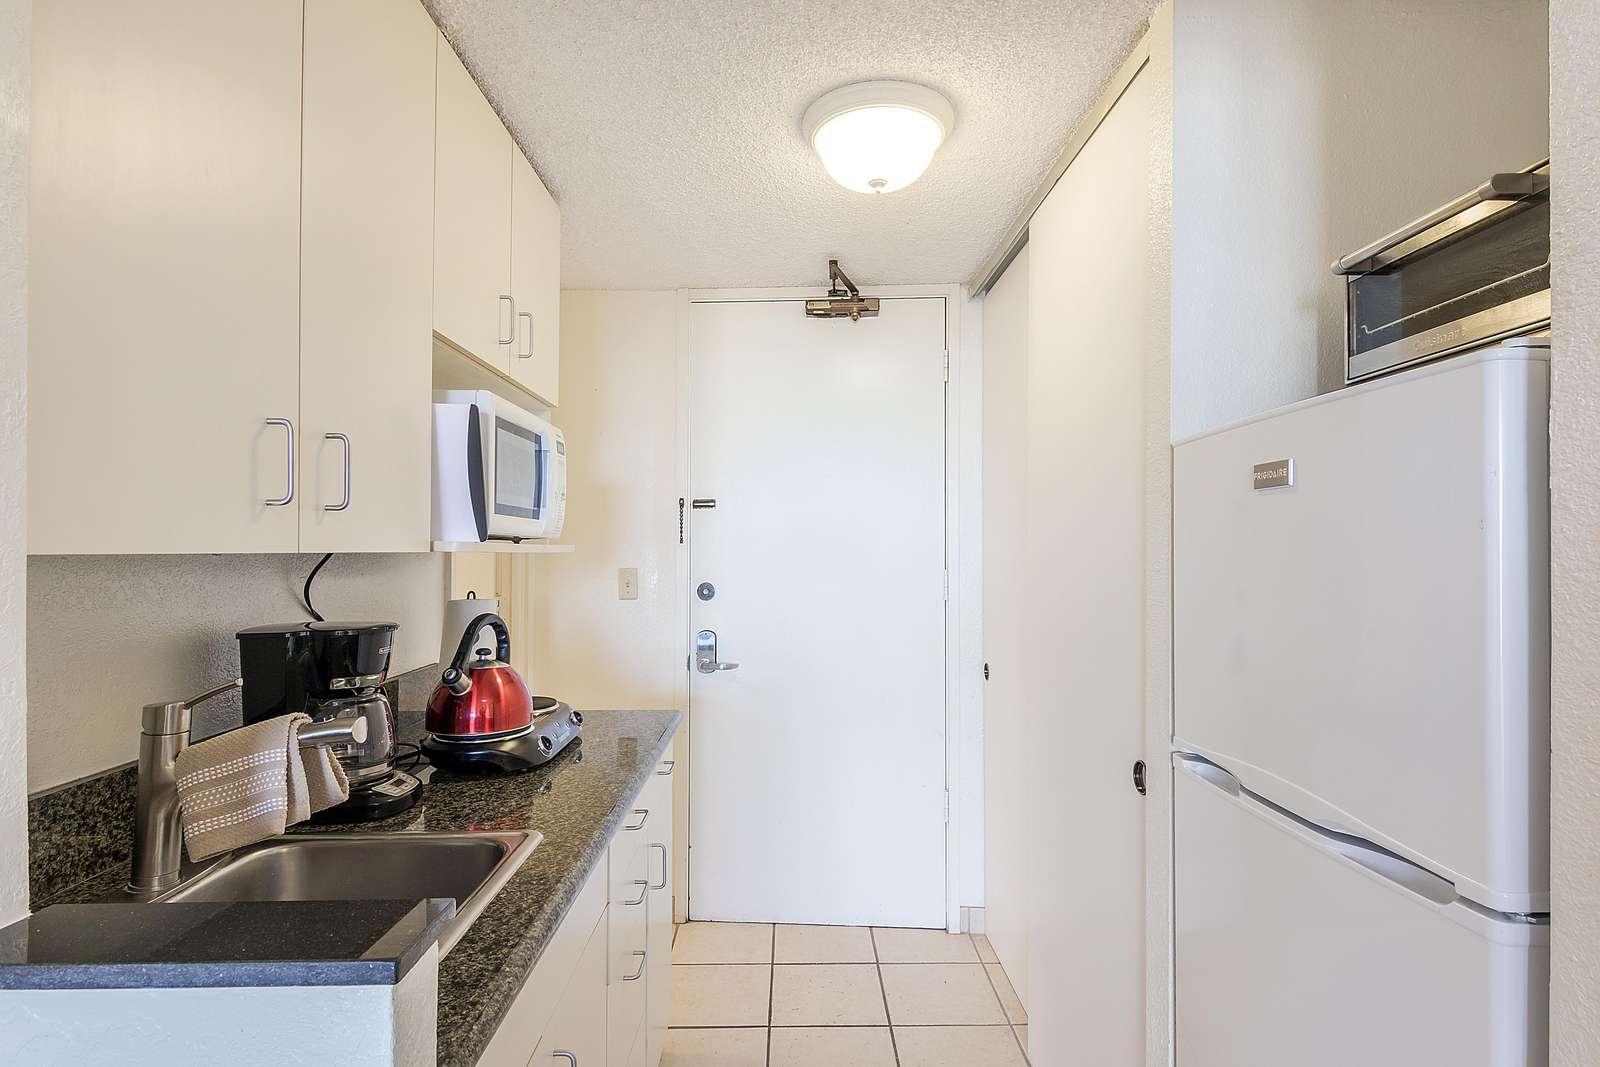 Kitchenette W/ Full Size Refrigerator